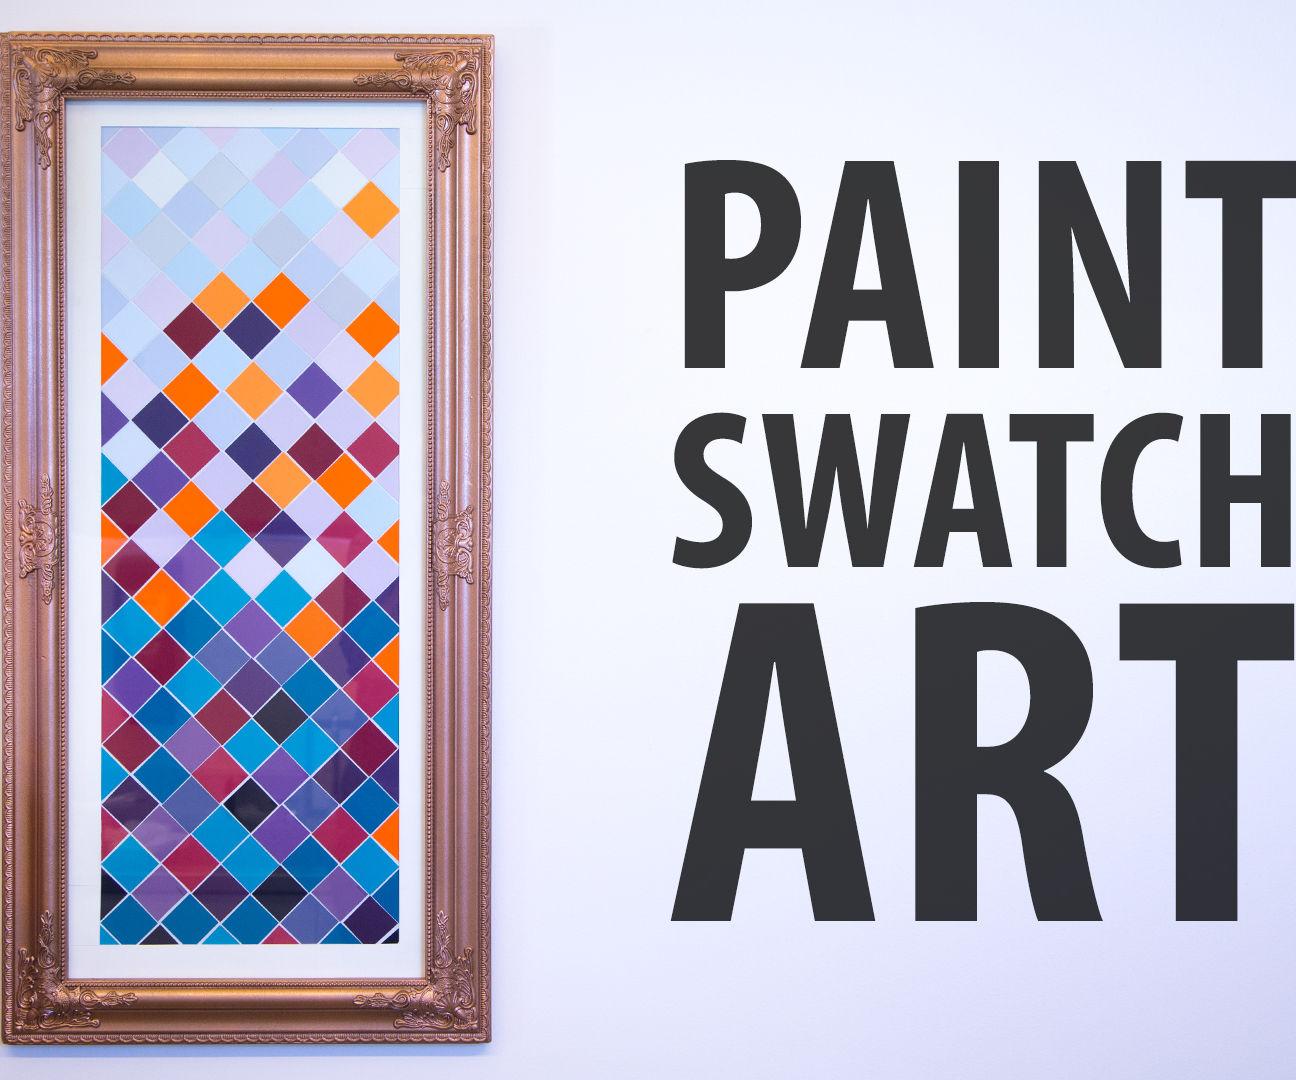 Paint swatch art